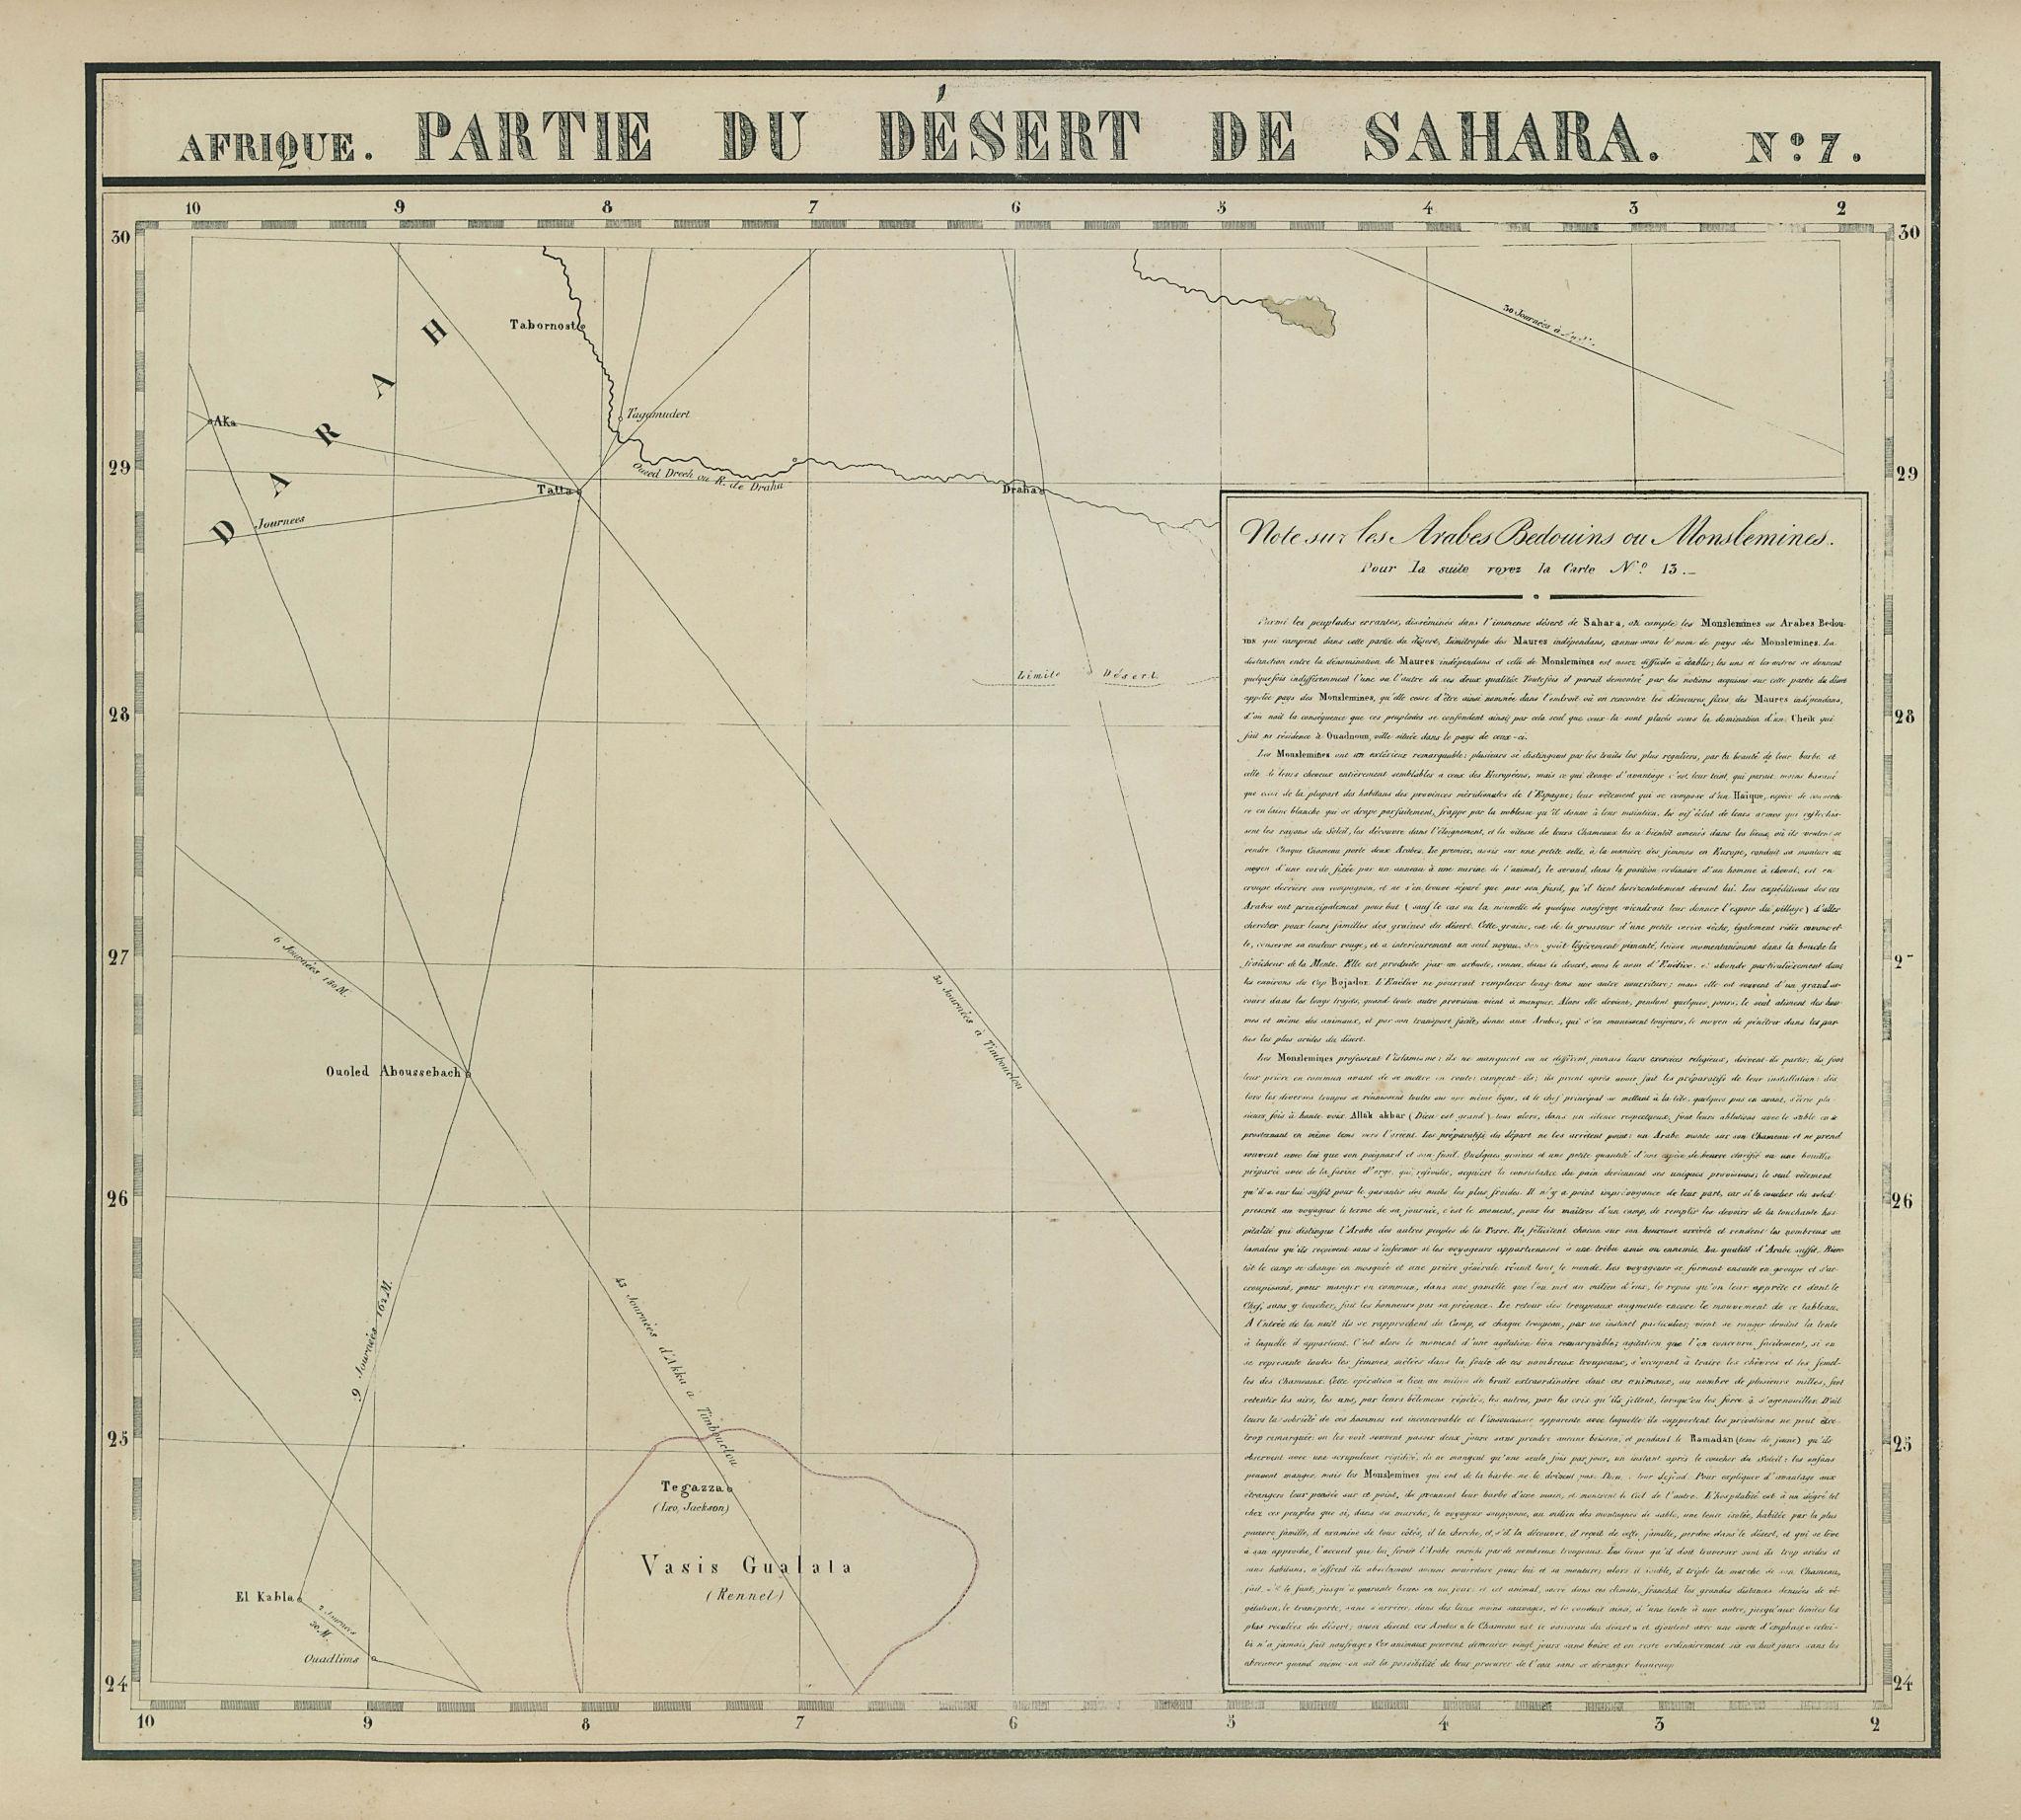 Afrique Partie… Désert de Sahara 7 Algeria Mauritania Mali VANDERMAELEN 1827 map